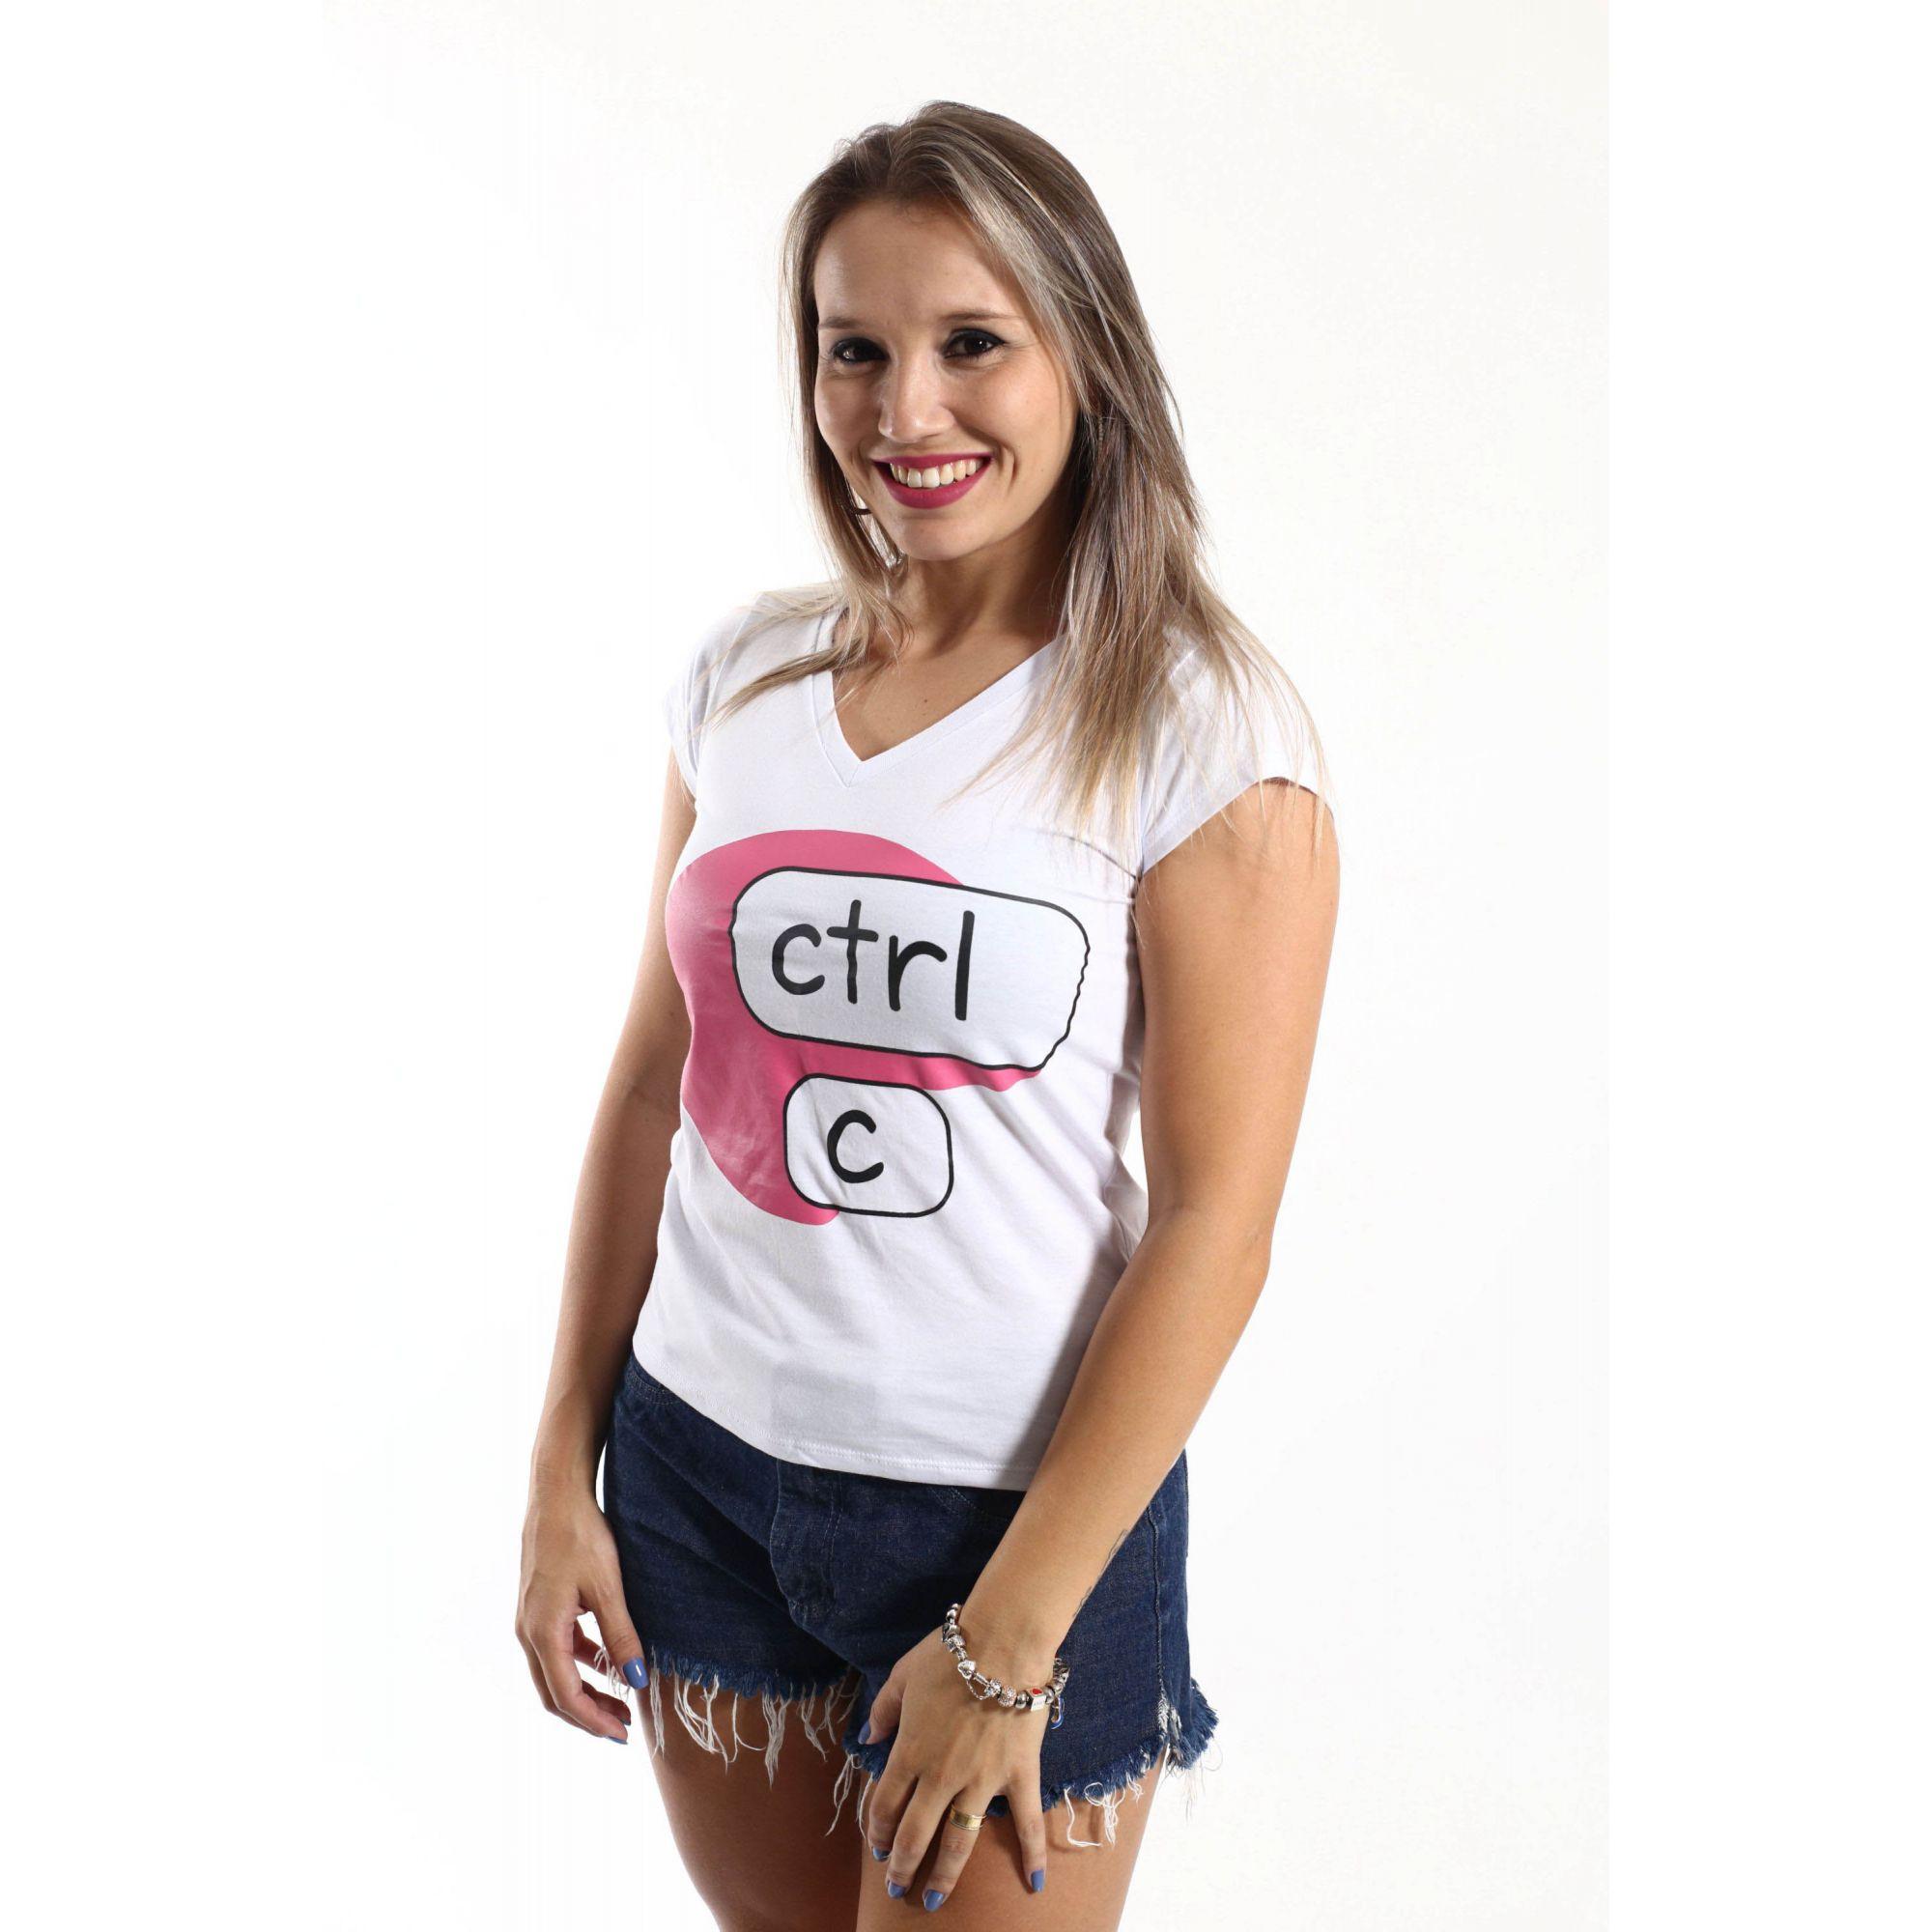 Camiseta Feminina Ctrl-C Rosa  - Heitor Fashion Brazil